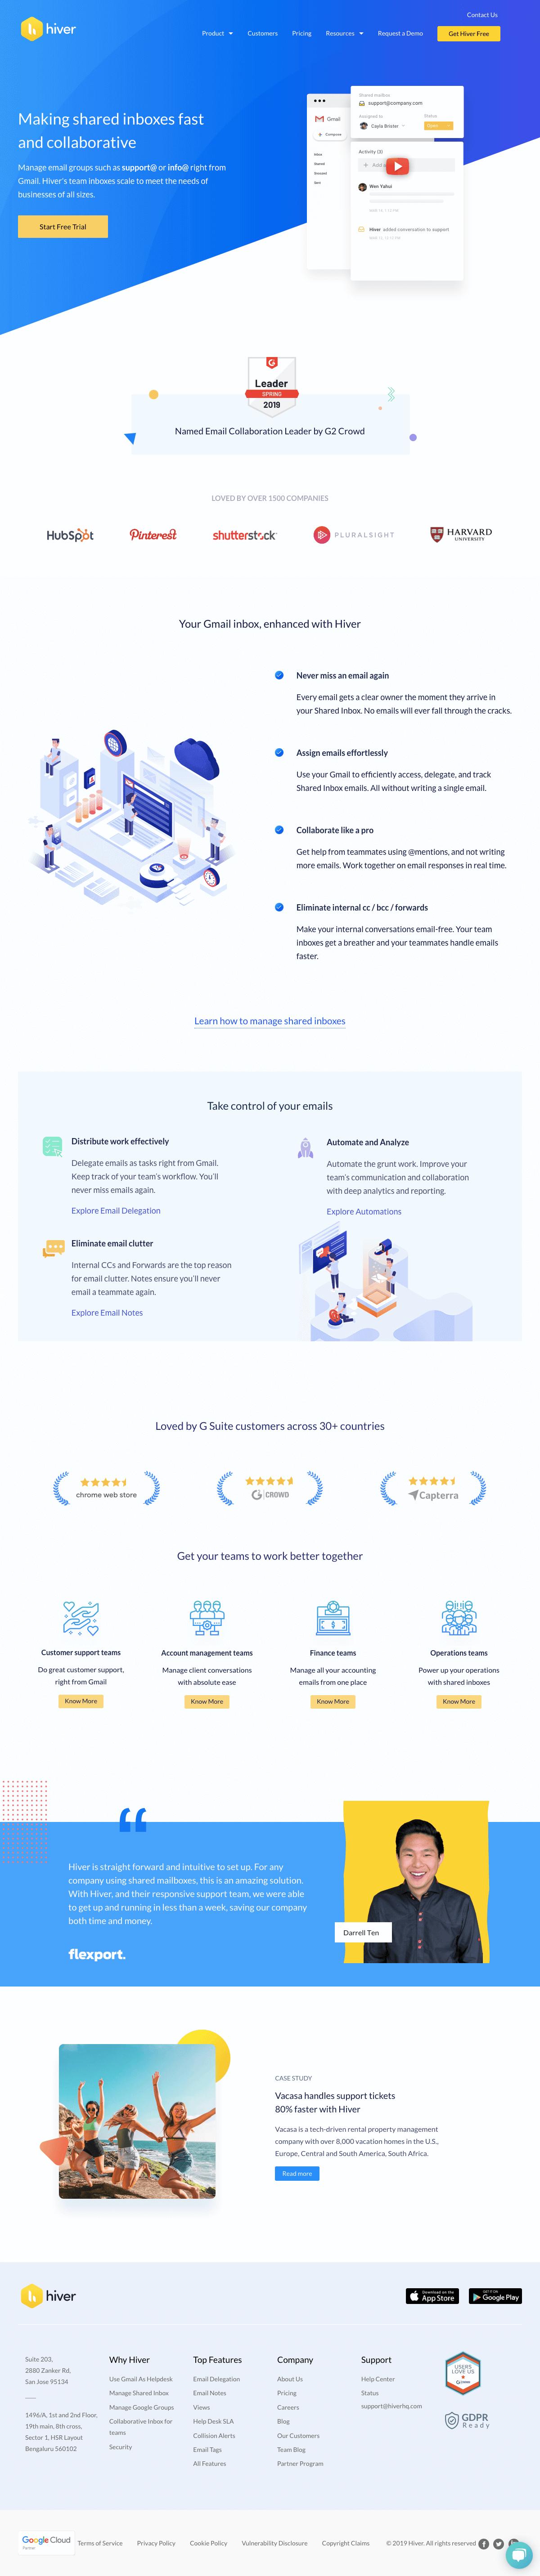 Hiver - Homepage